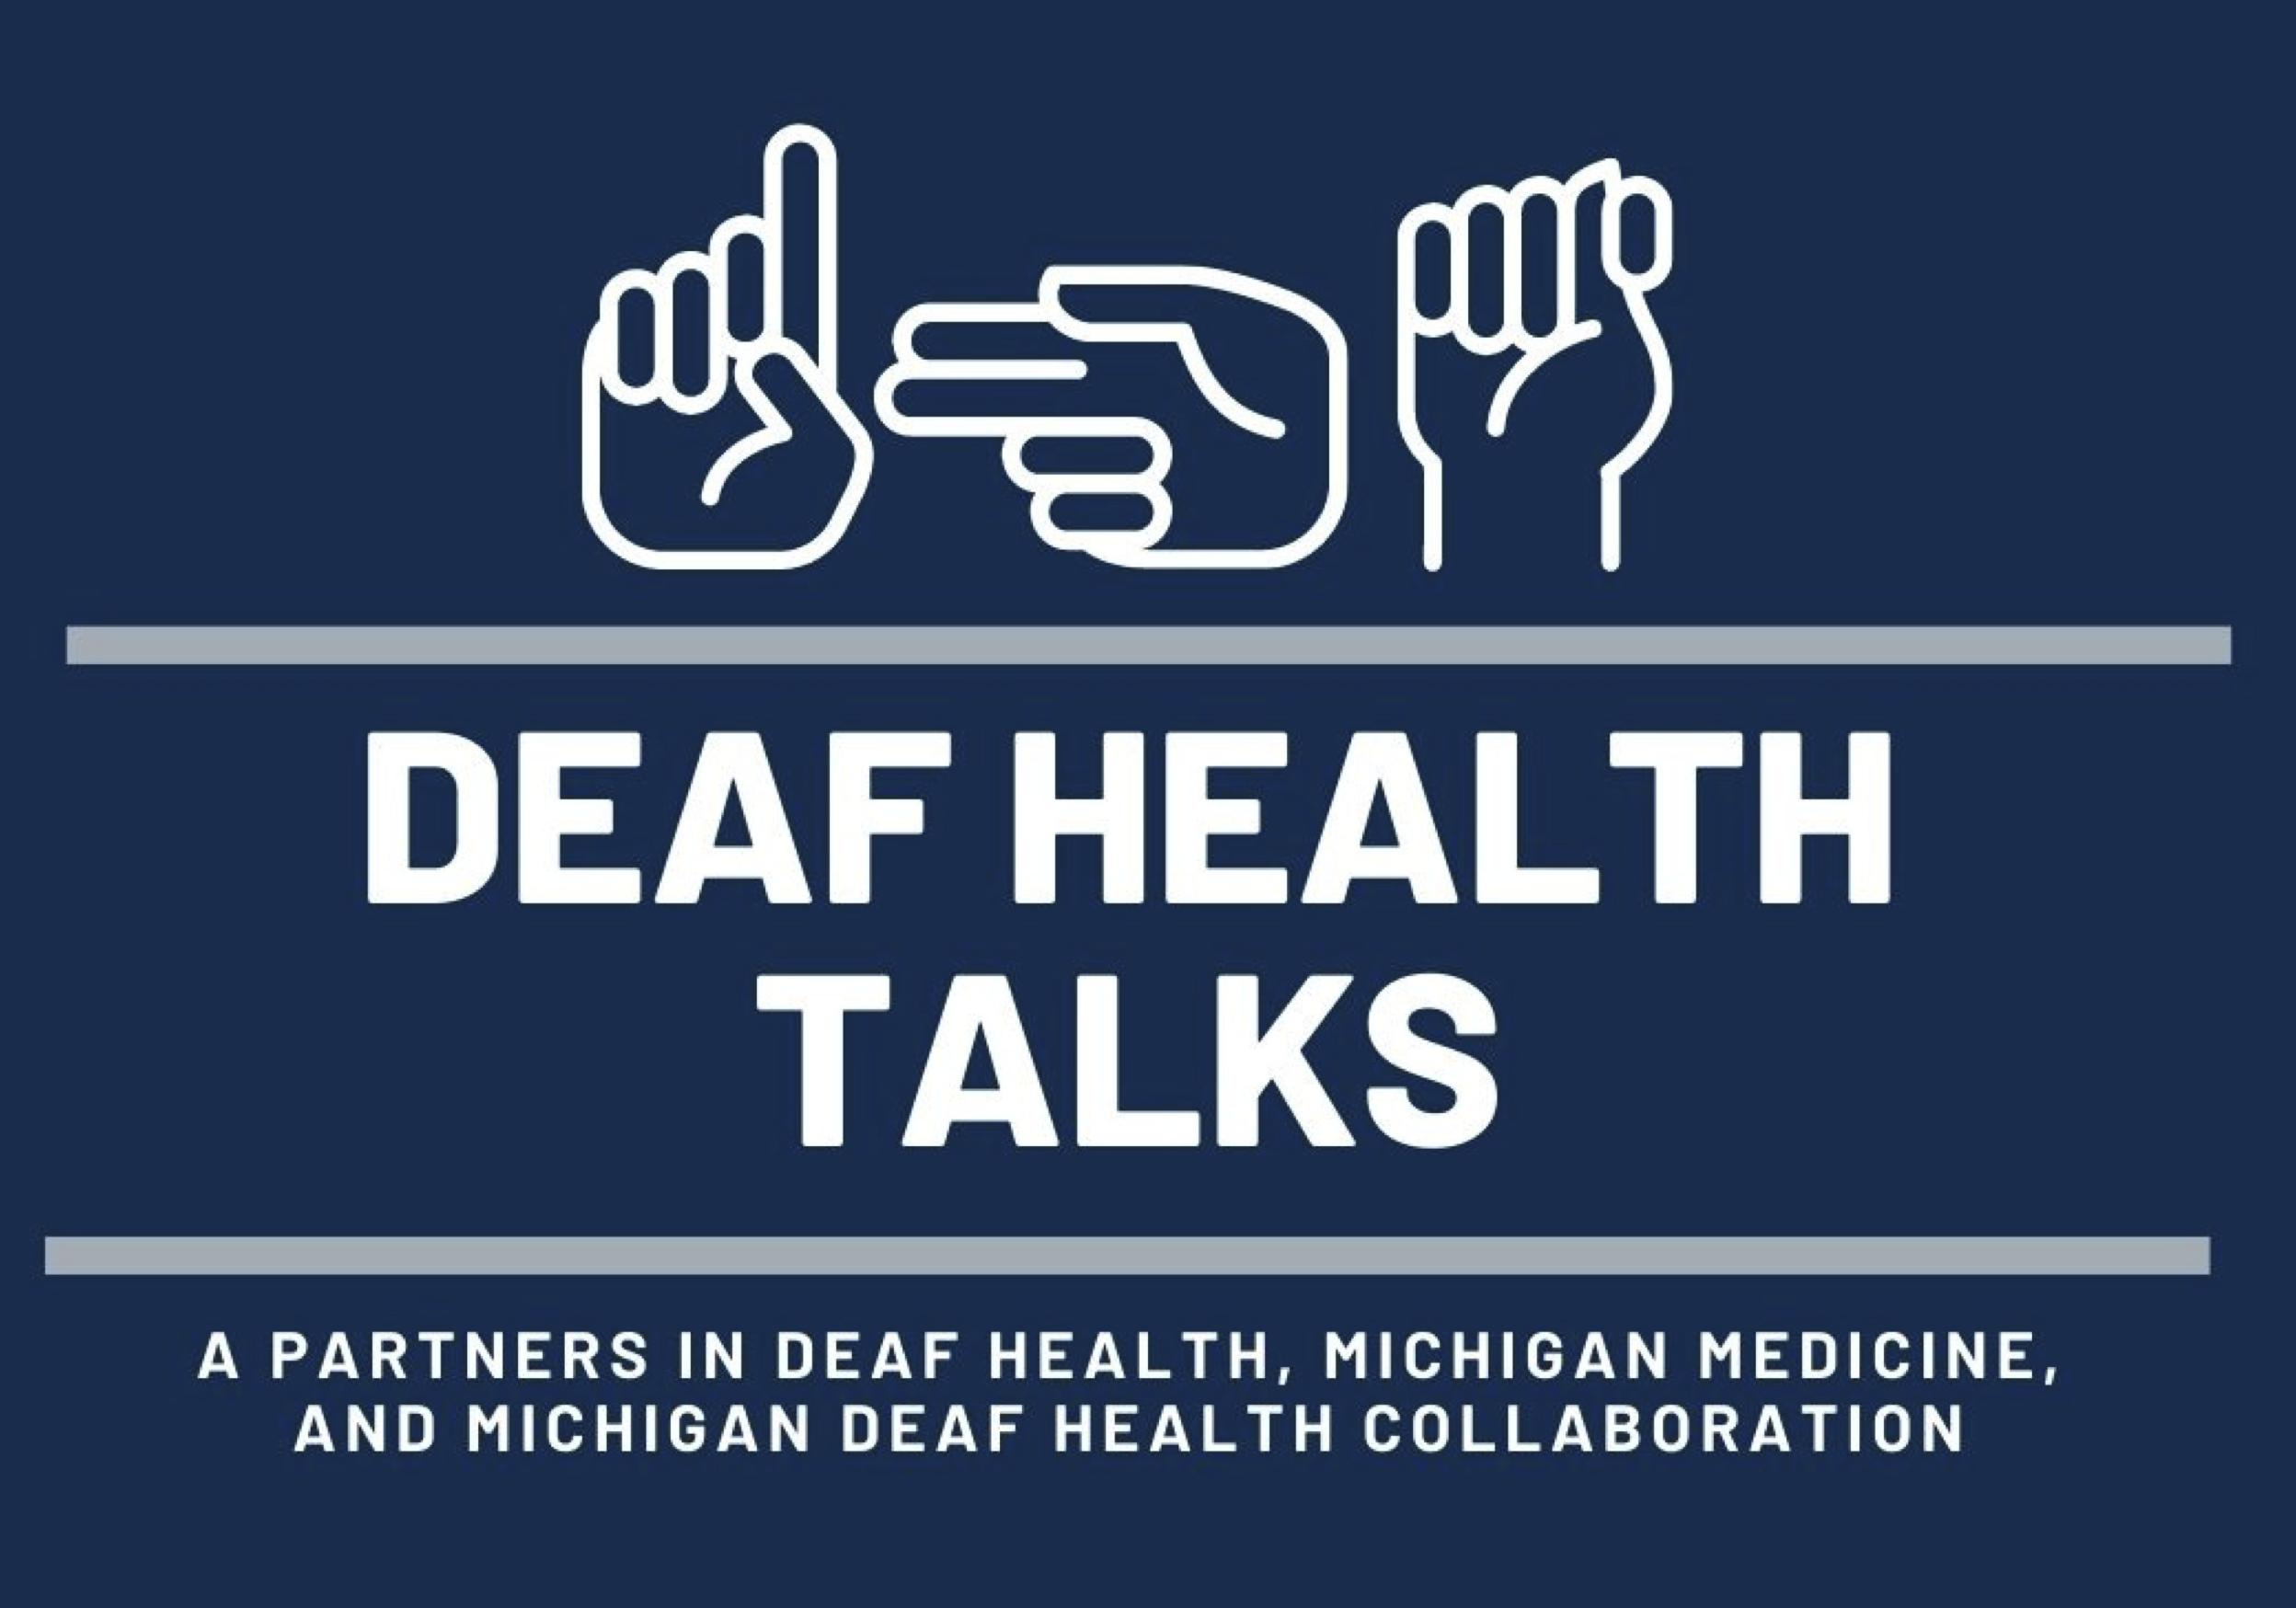 Deaf Health Talks: A Partners in Deaf Health, Michigan Medicine, and Michigan Deaf Health Collaboration